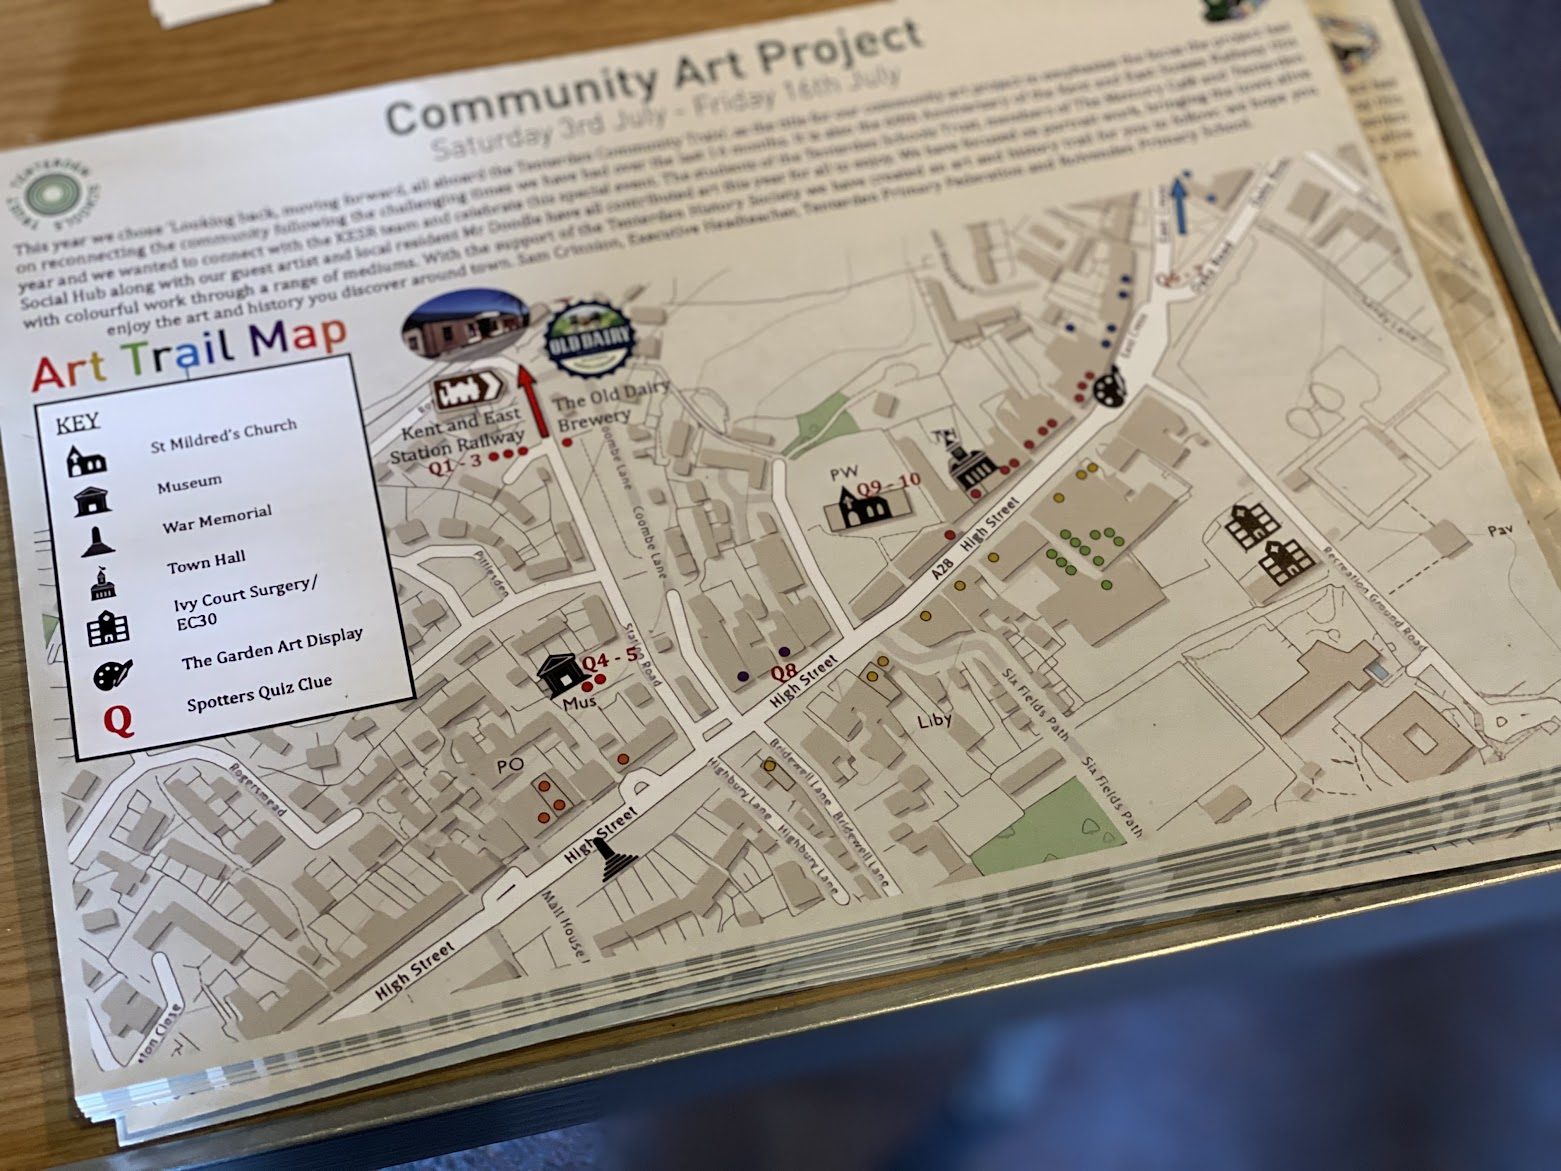 Tenterden Schools Trust Community Art Project 2021 - Art Trail